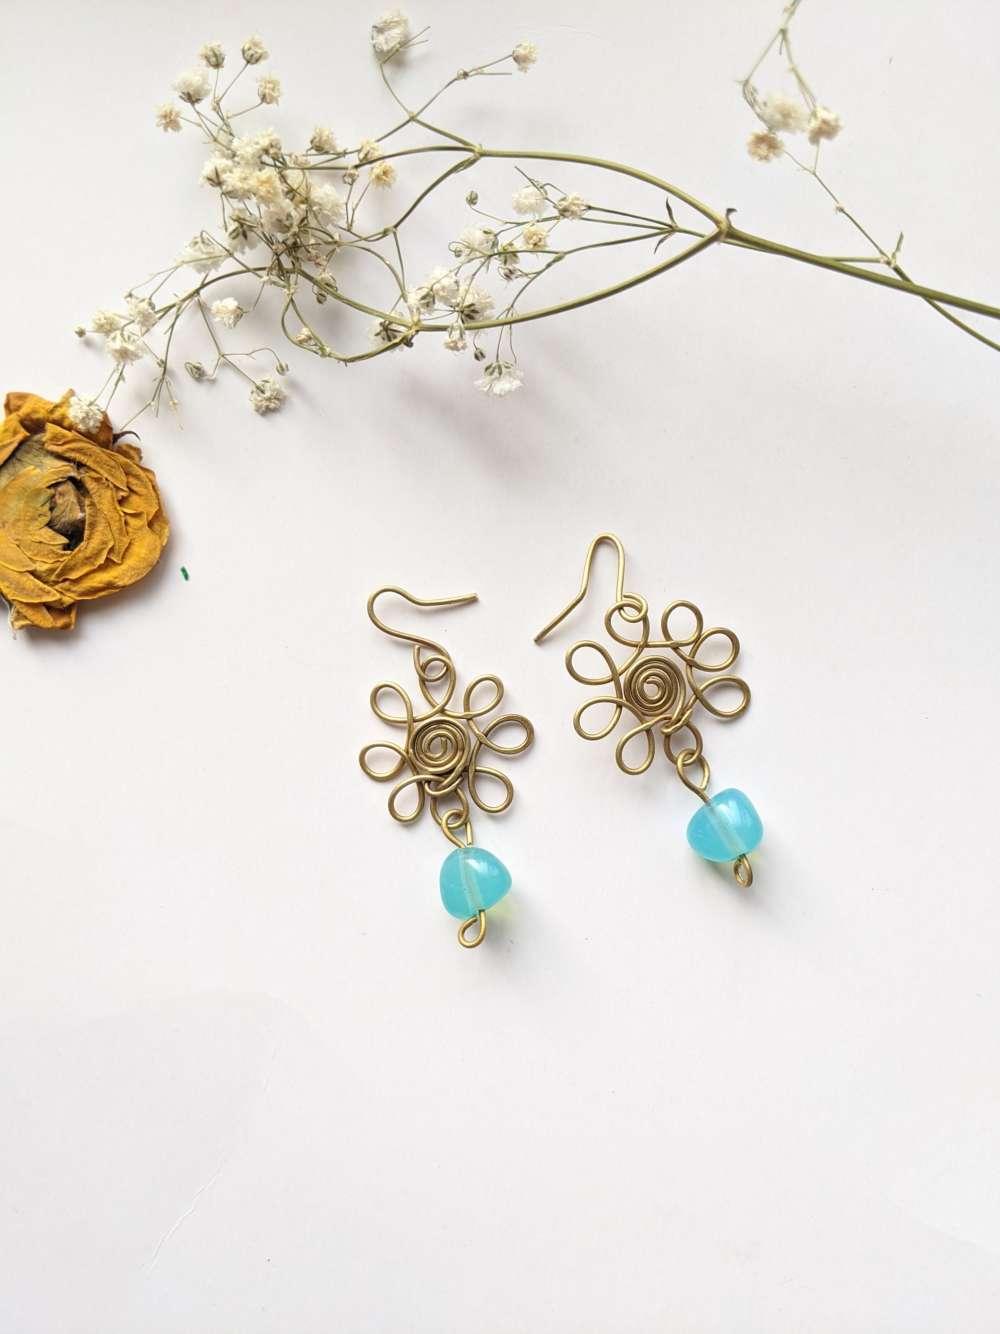 Floral wire earrings danglers